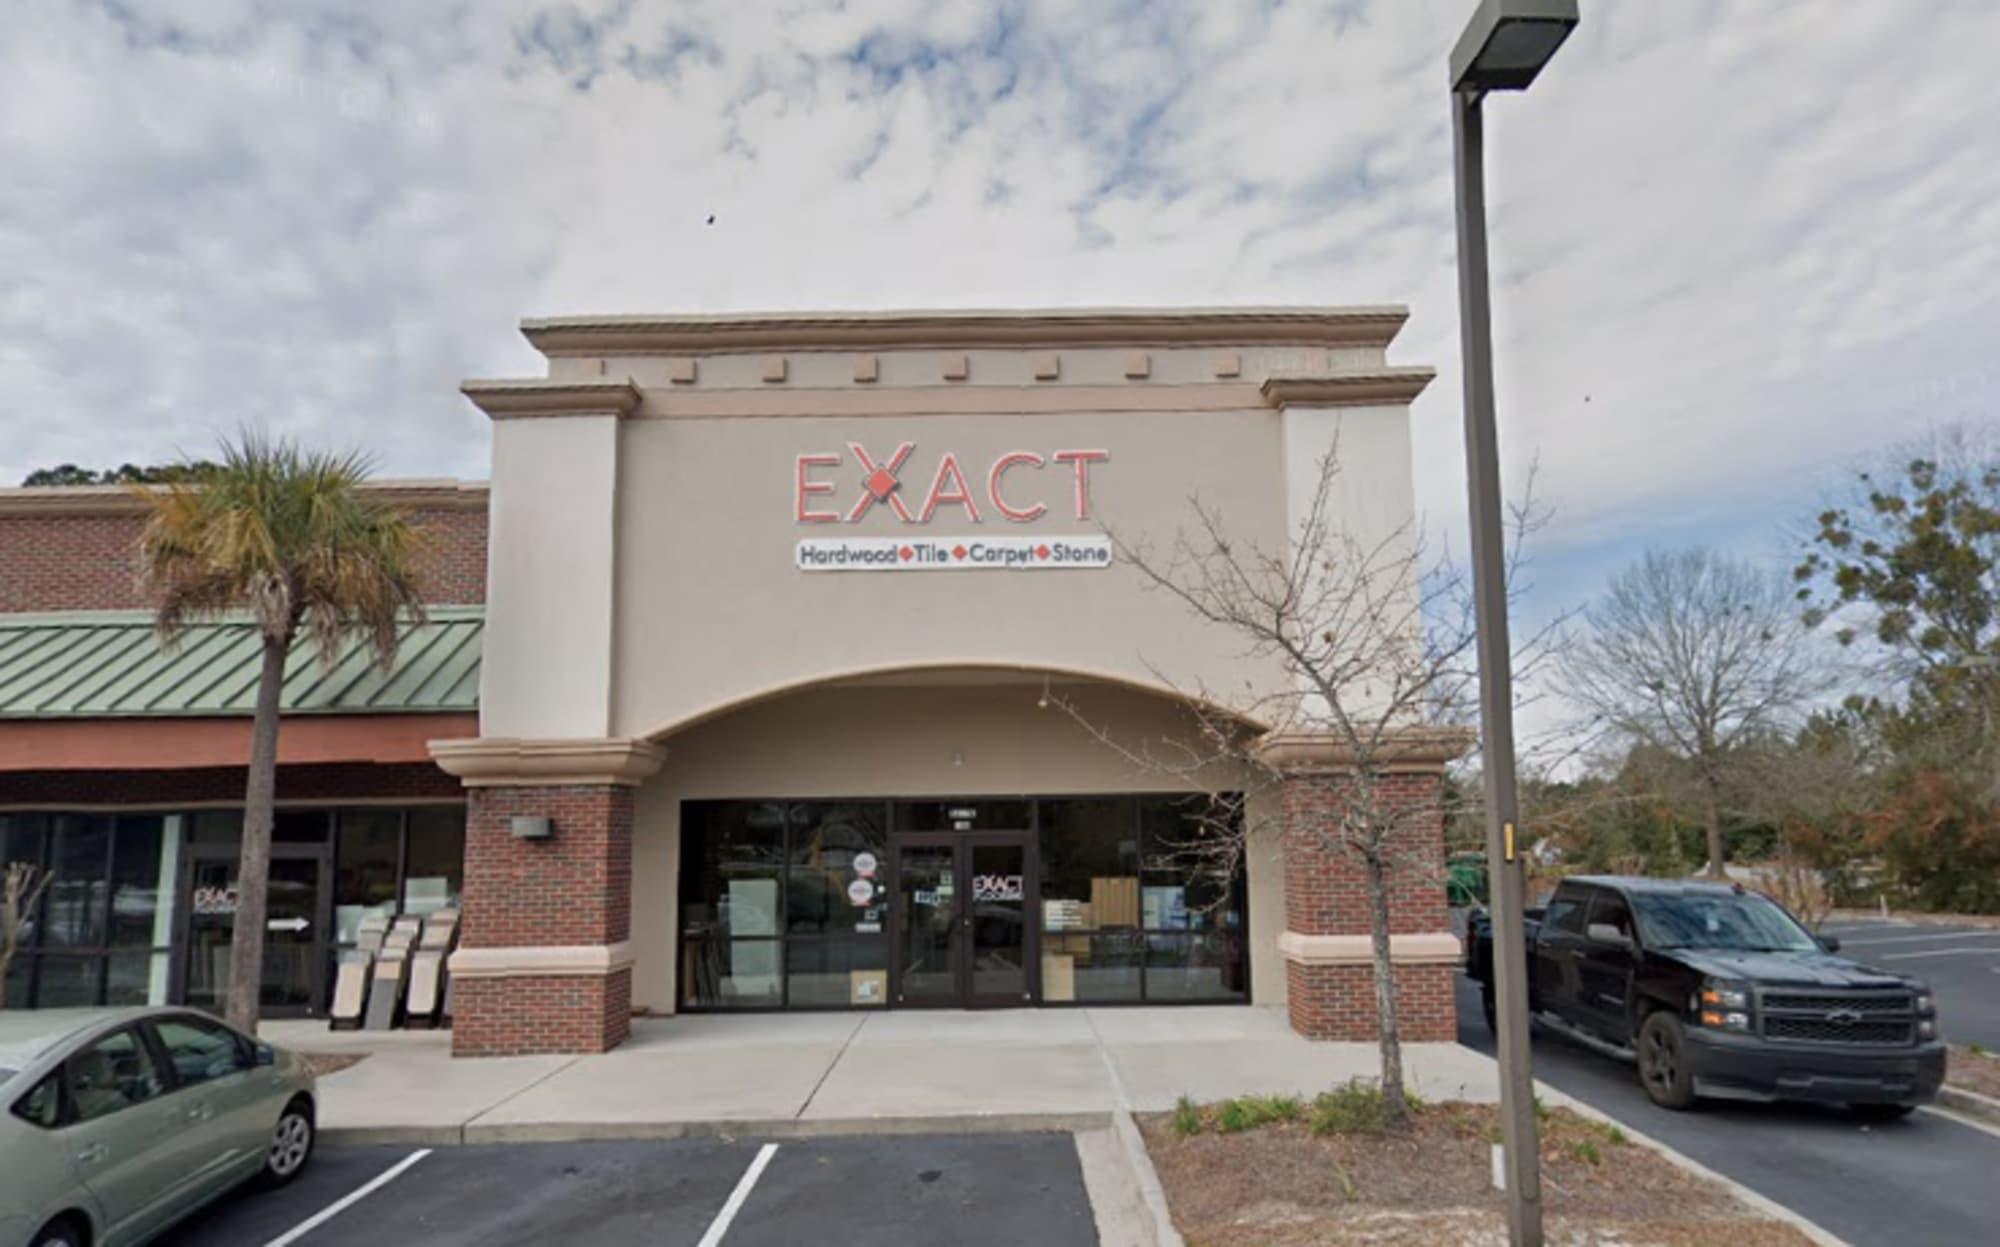 Exact Flooring Inc - 103 Okatie Center Blvd S Okatie, SC 29909